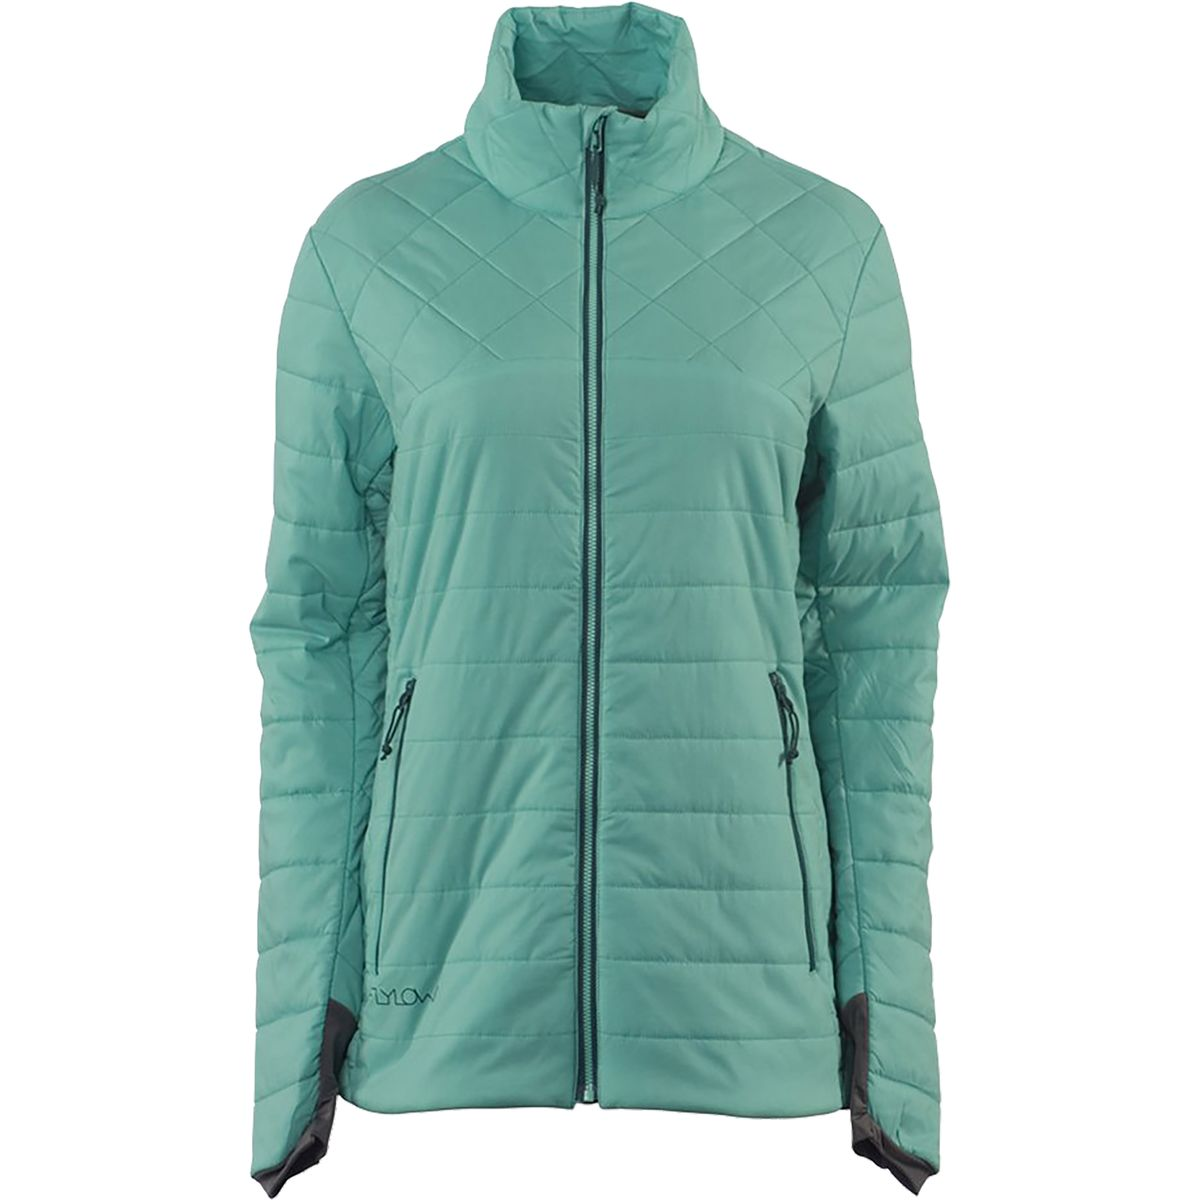 Flylow Calypso Jacket - Women